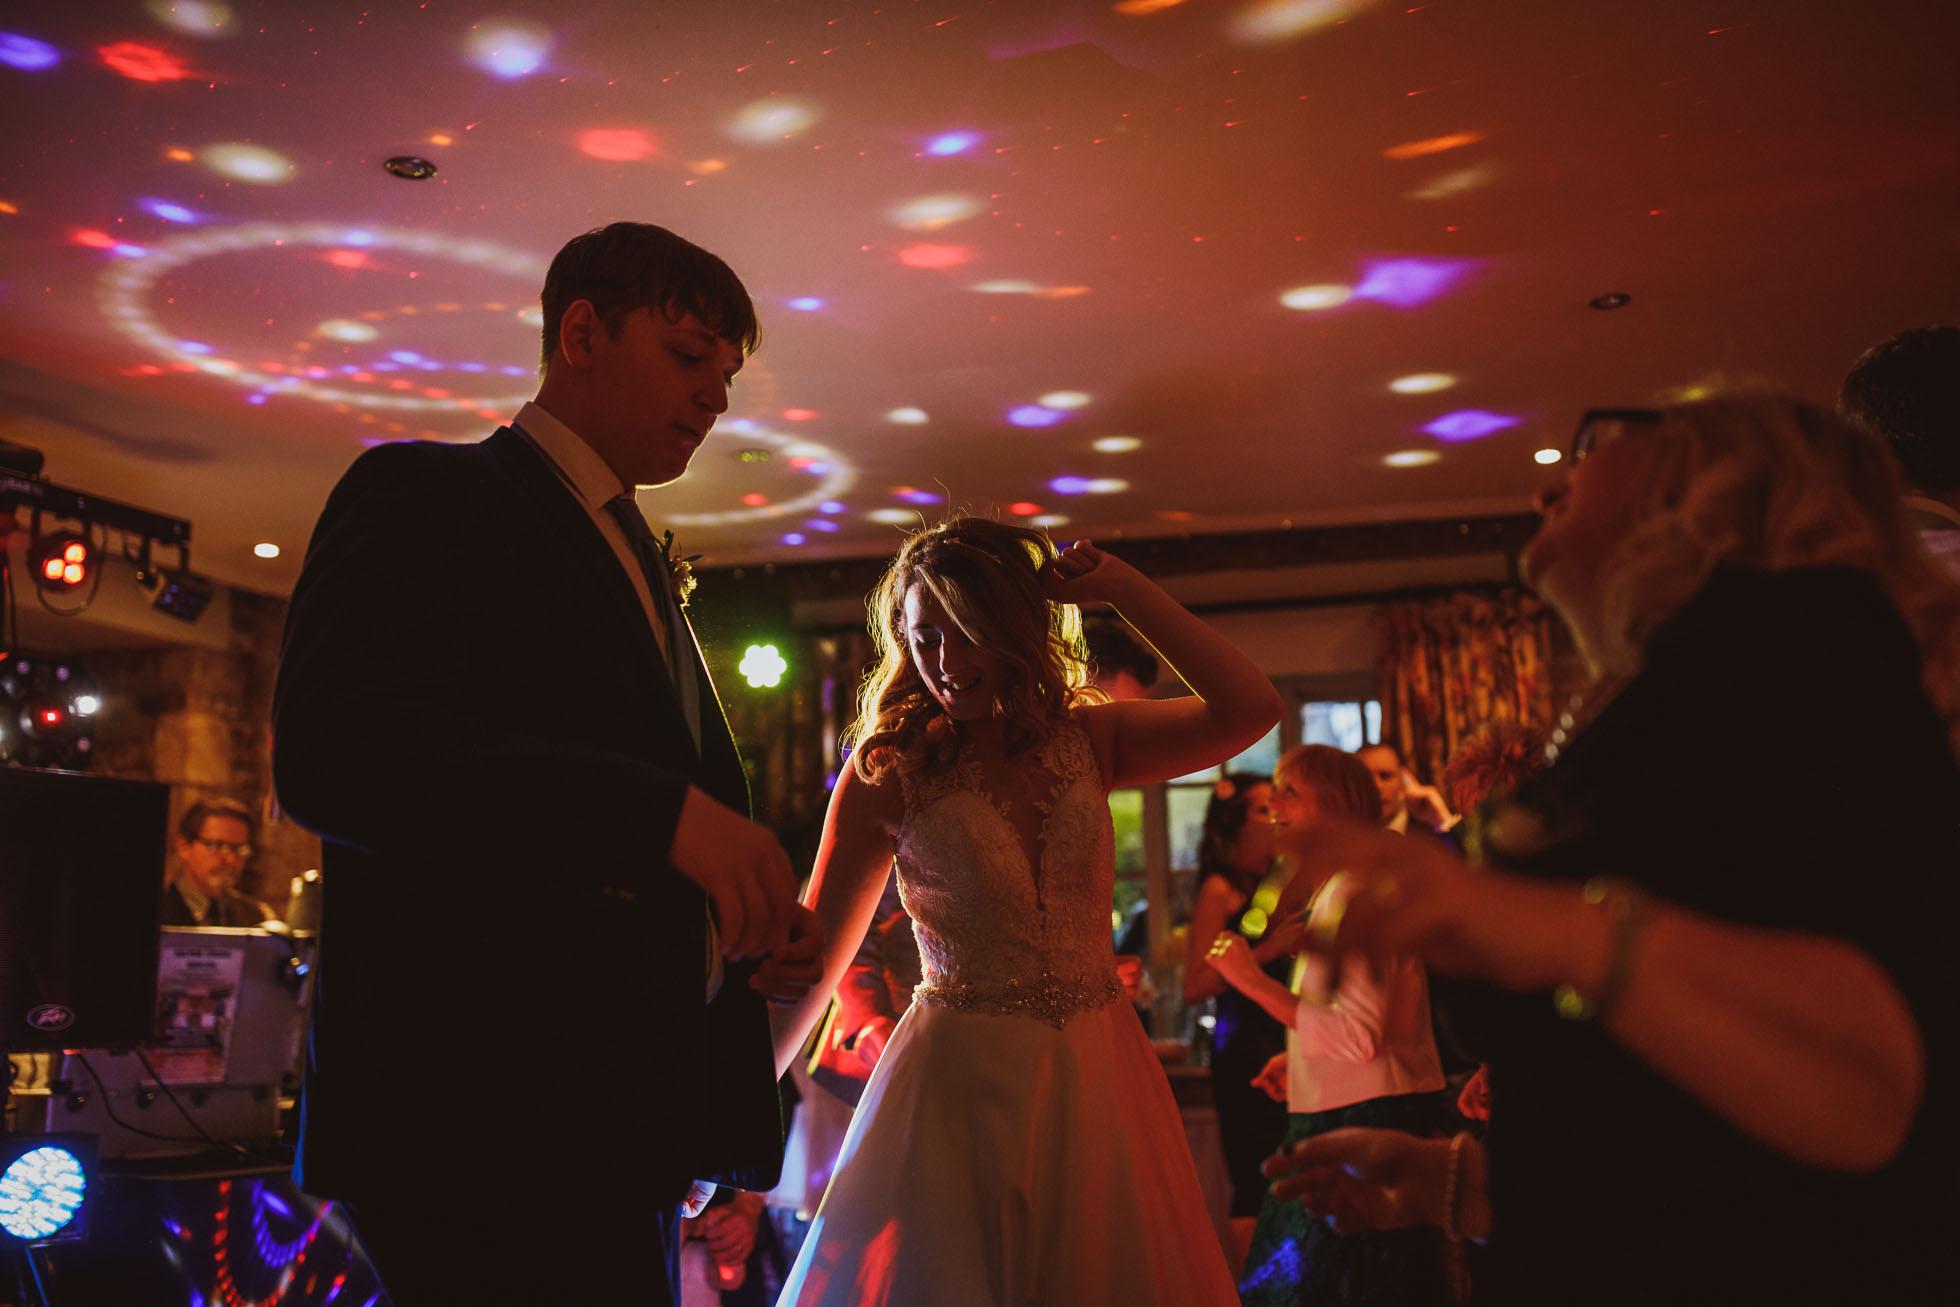 black_swan_helmsley_wedding_photographer-126.jpg